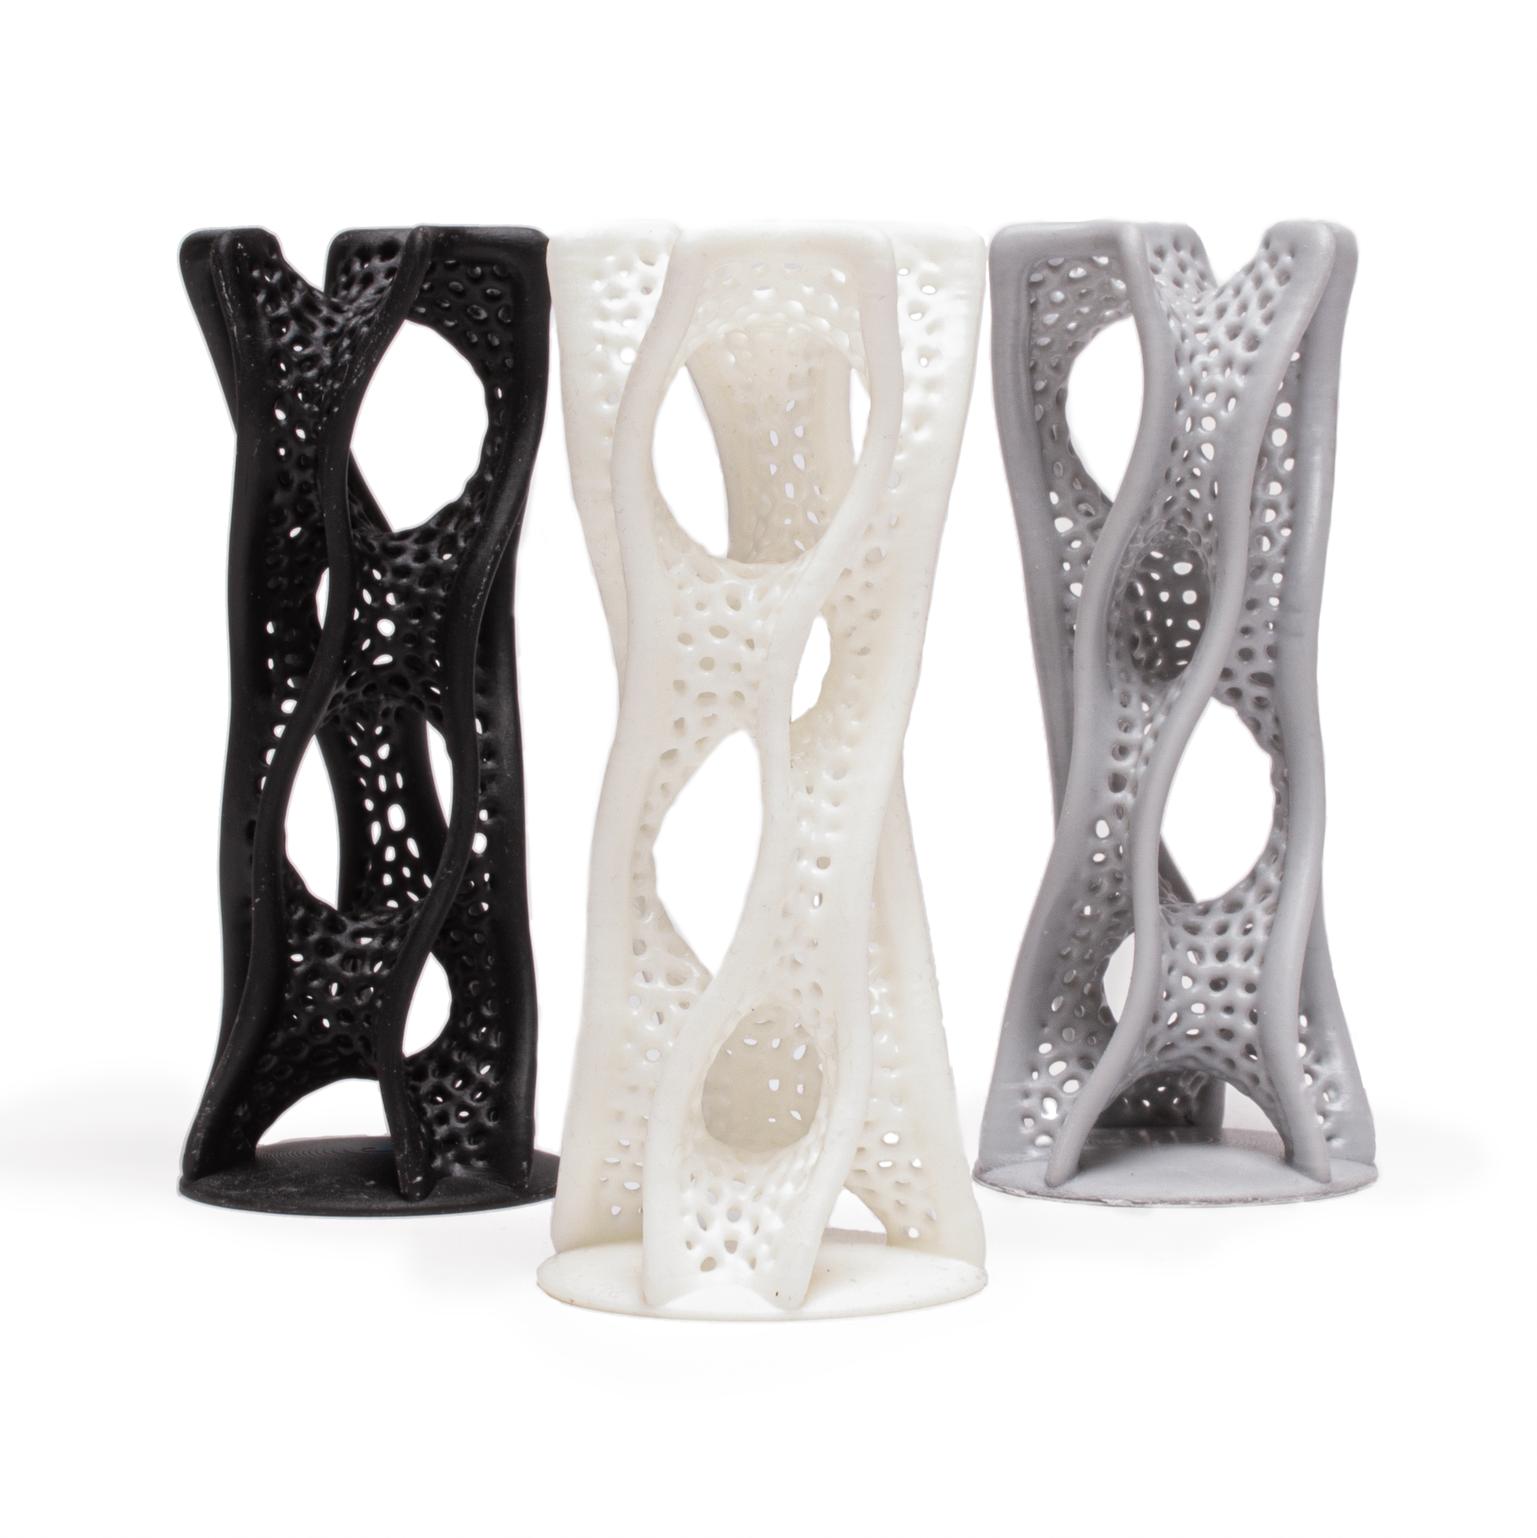 Živice a Resiny Monocure 3D FormFutura